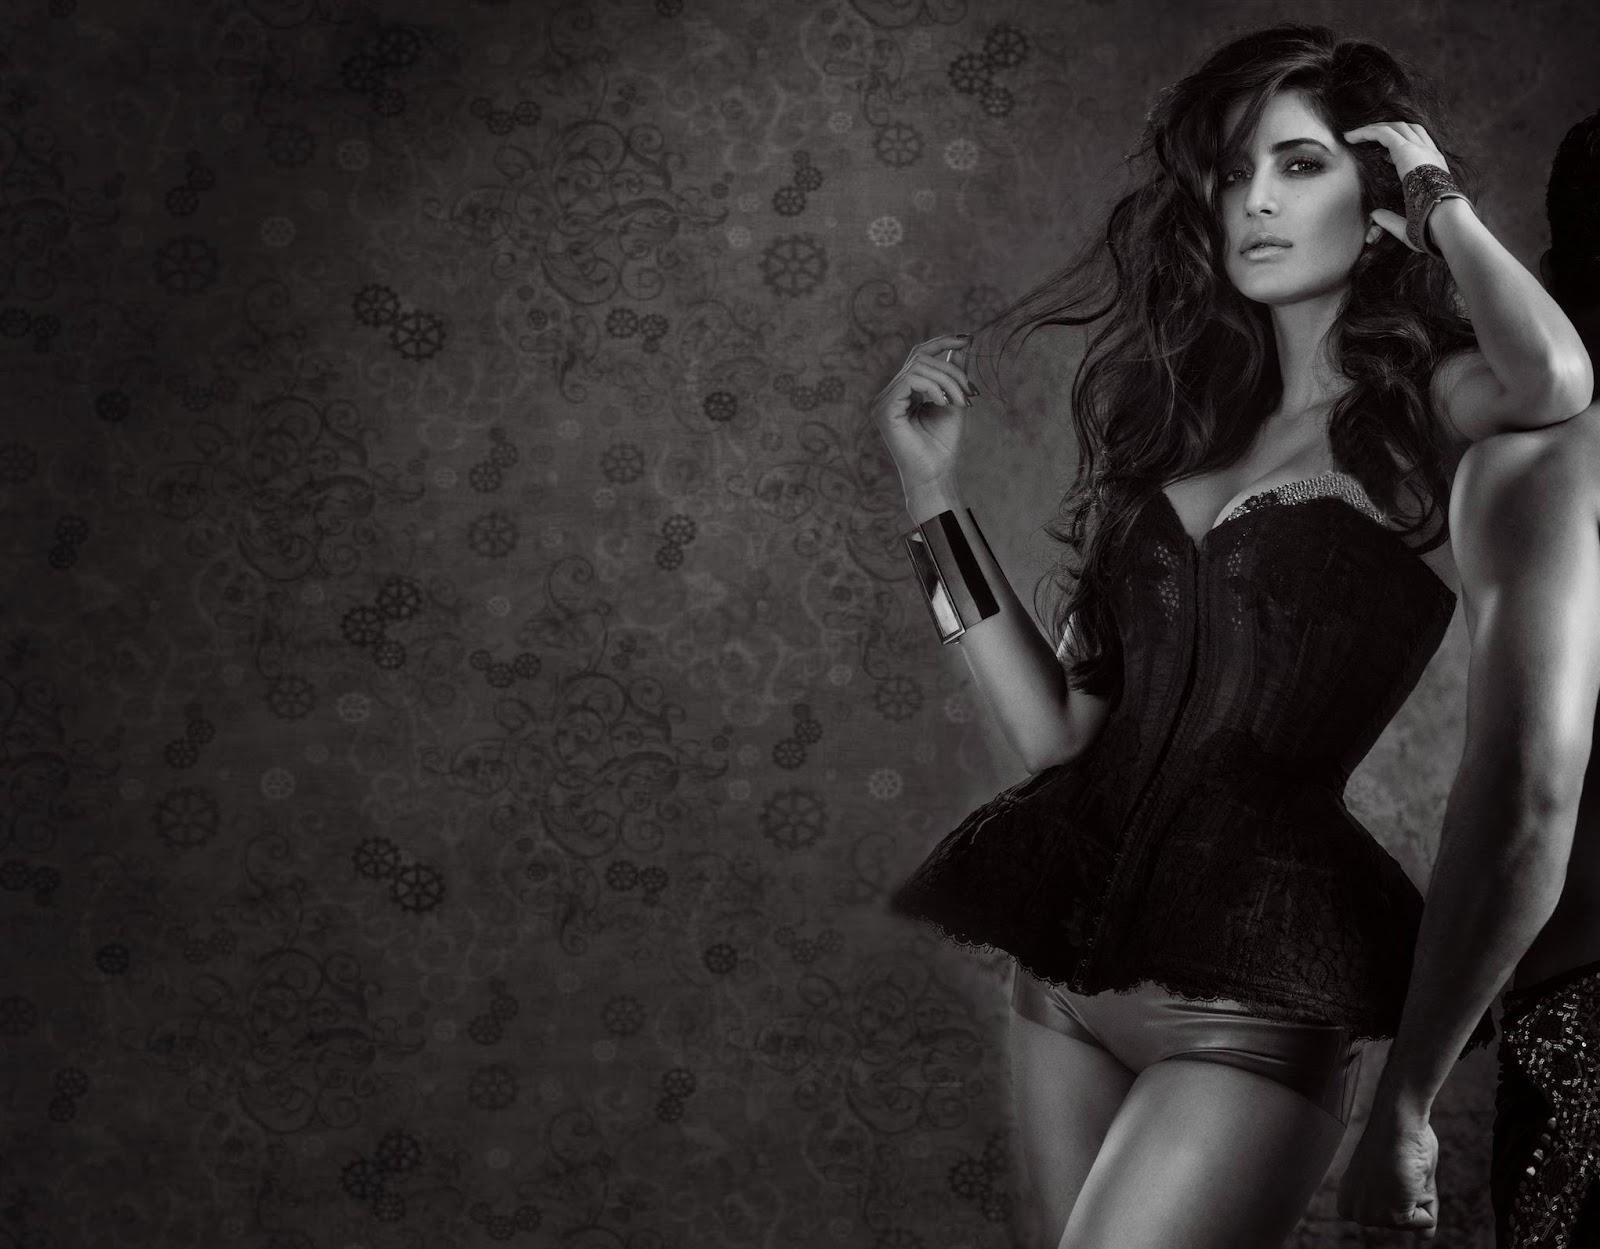 Katrina Kaif Maxim Wallpaper